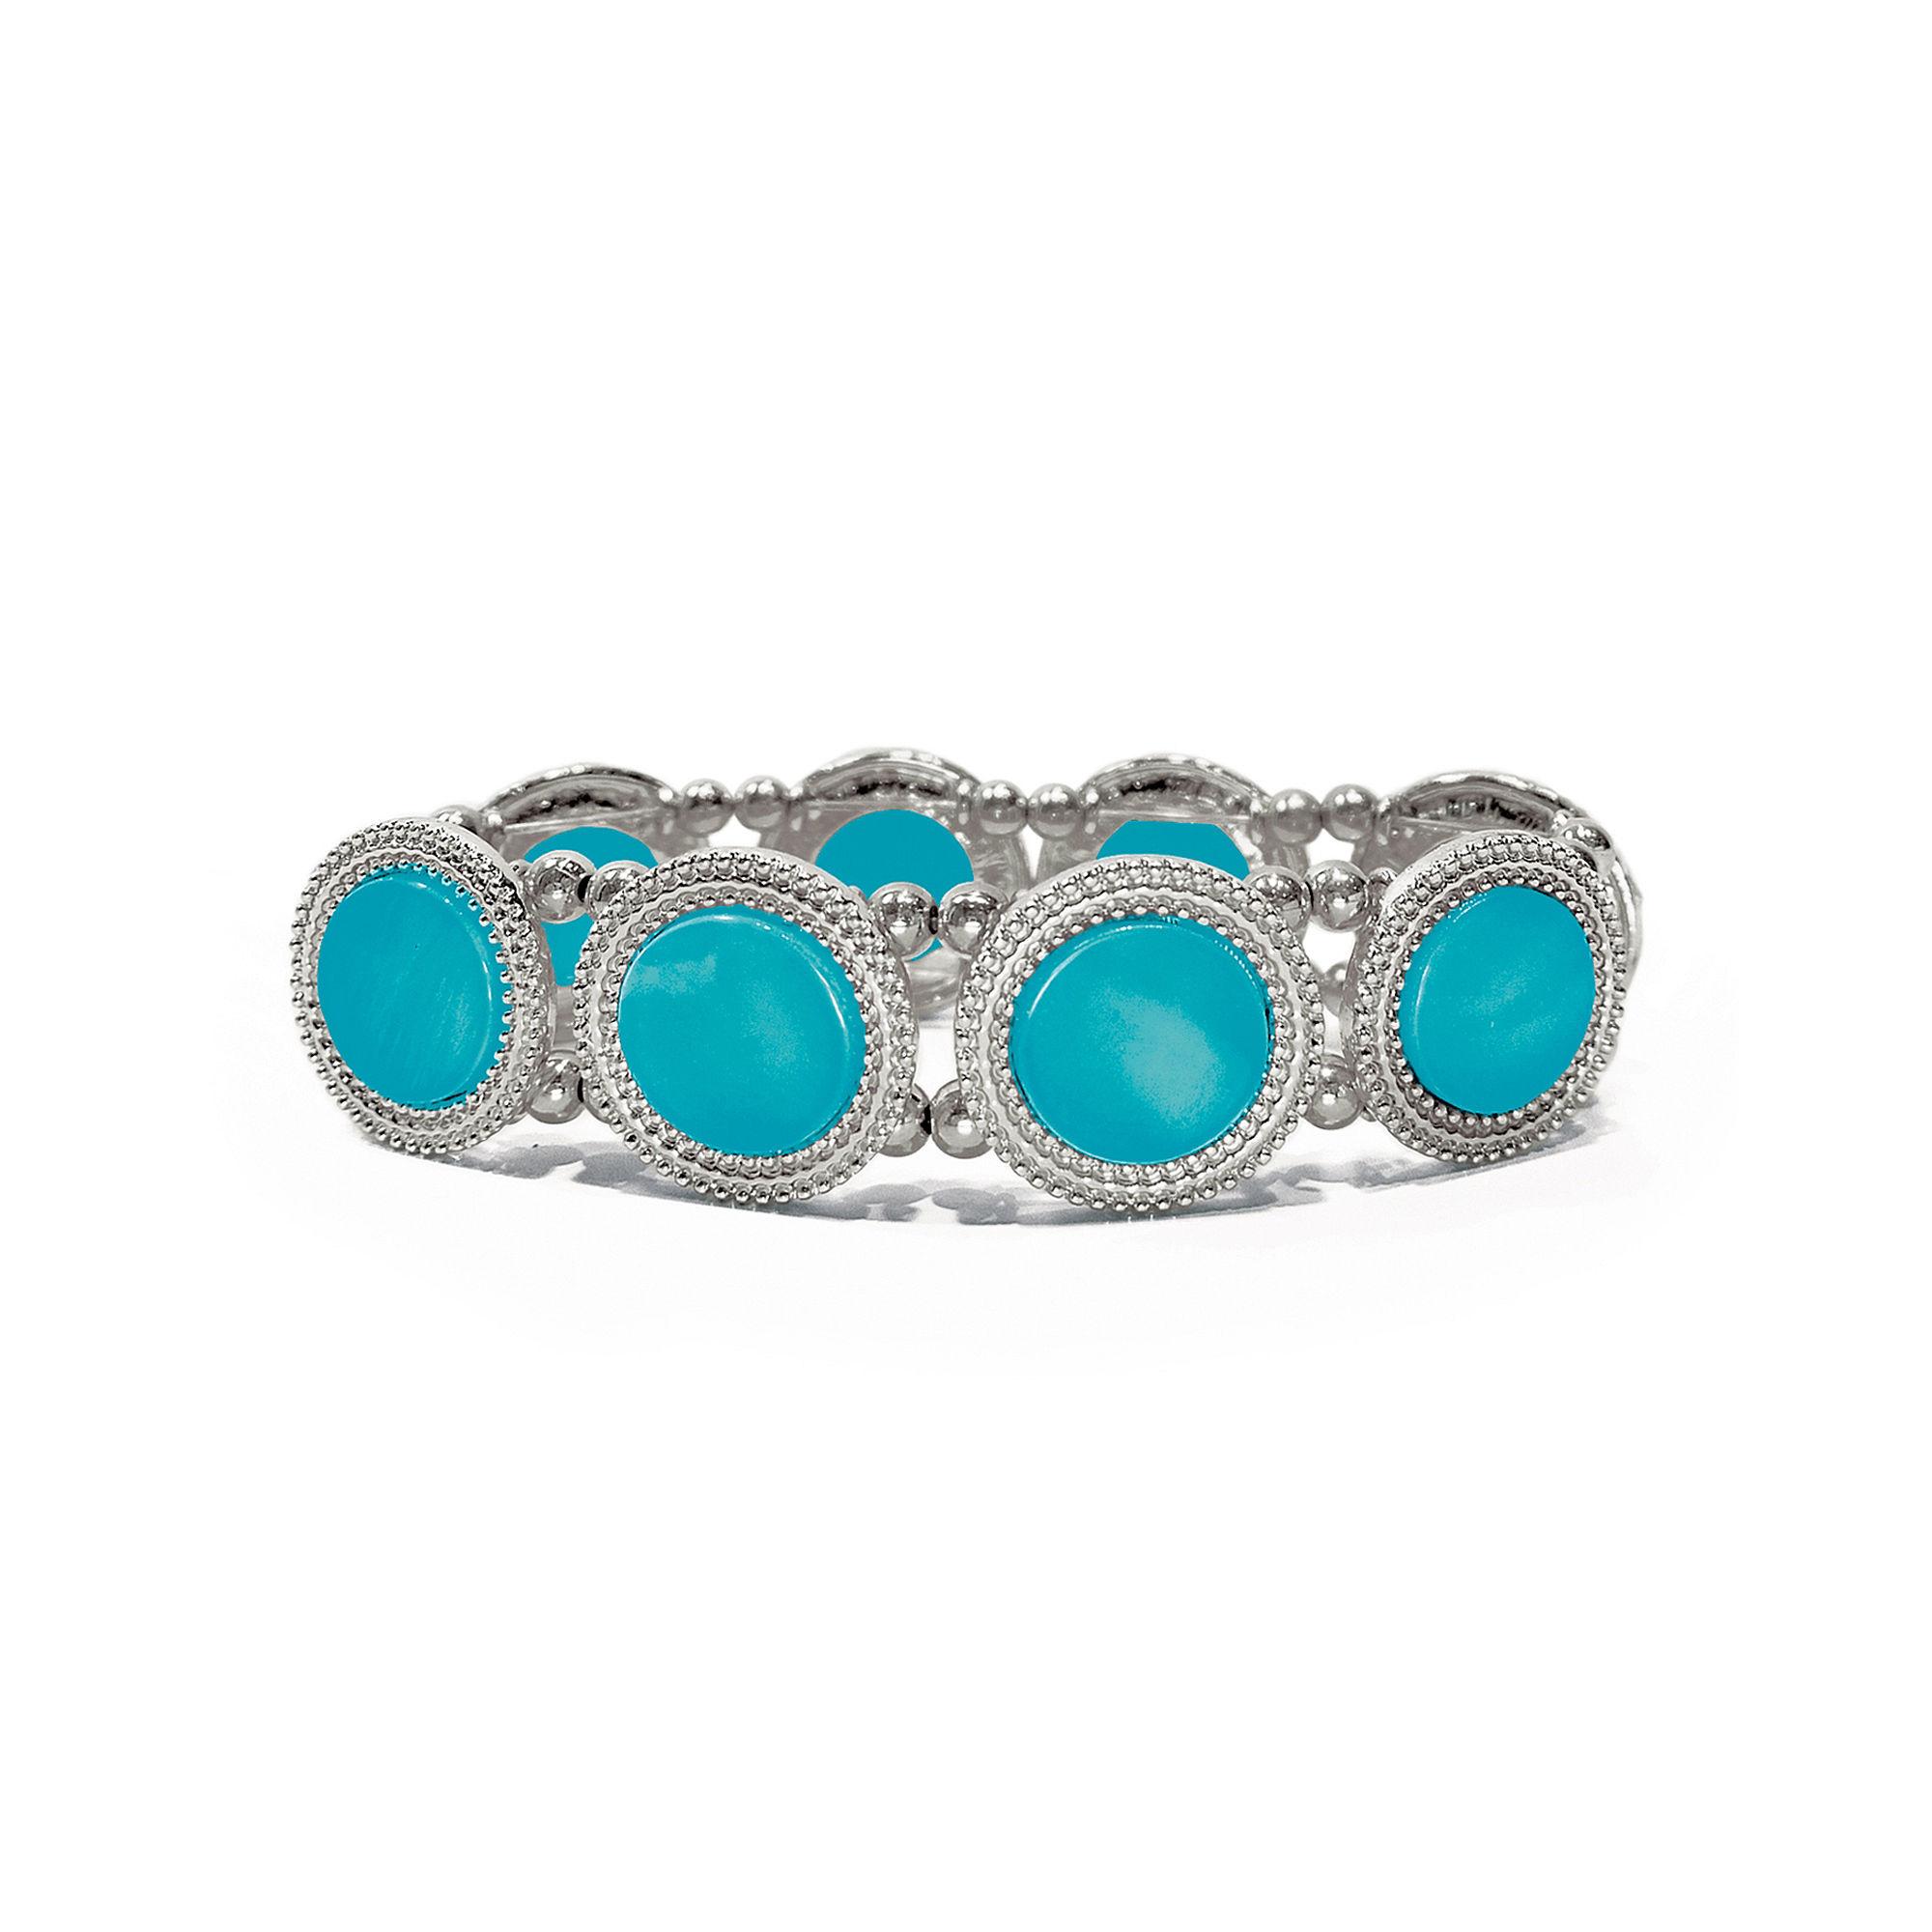 Studio by Carol Dauplaise Silver-Tone Blue Disc Stretch Bracelet